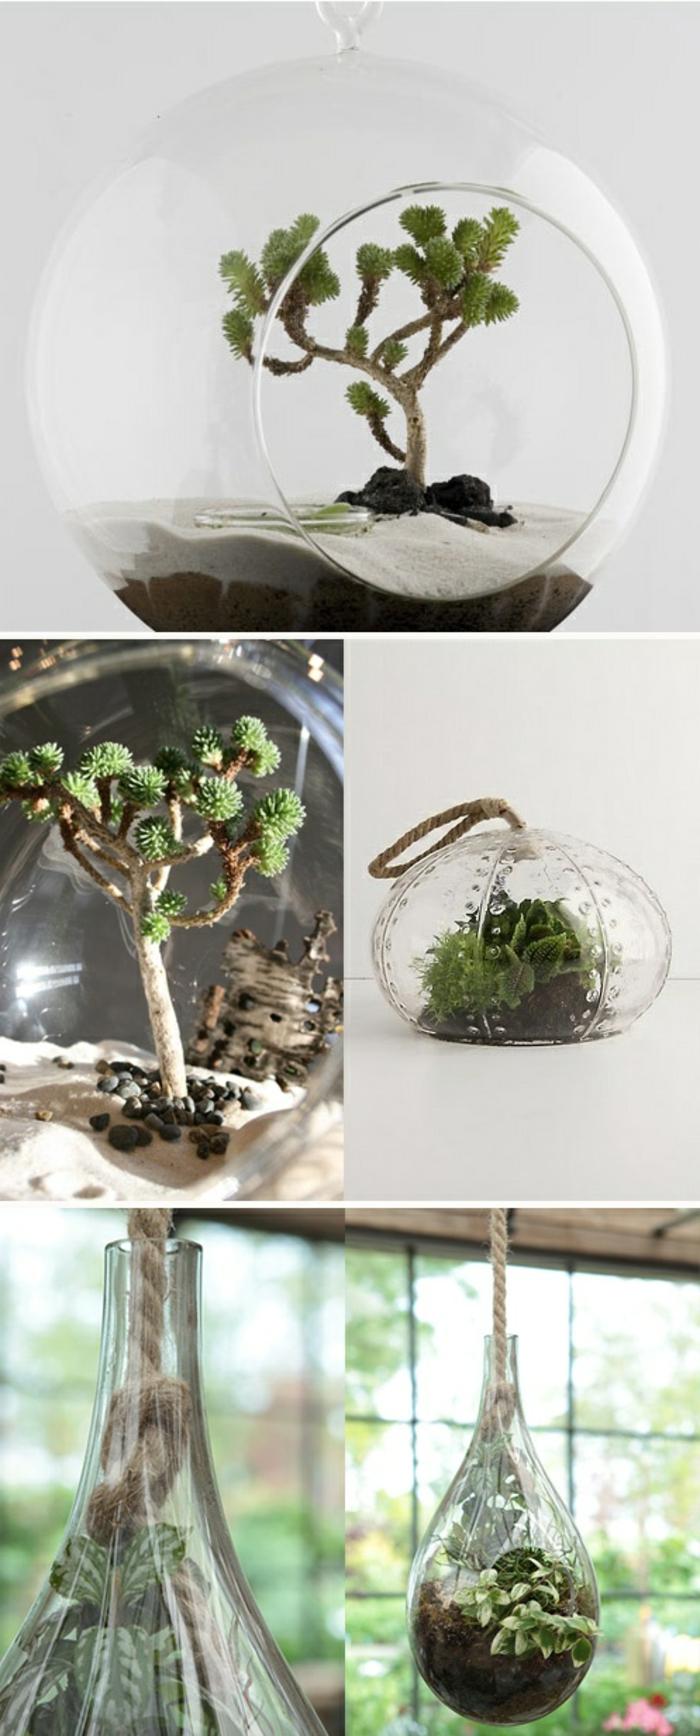 jardin miniature, récipient en verre, terrarium suspendu, sable blanc, terreau